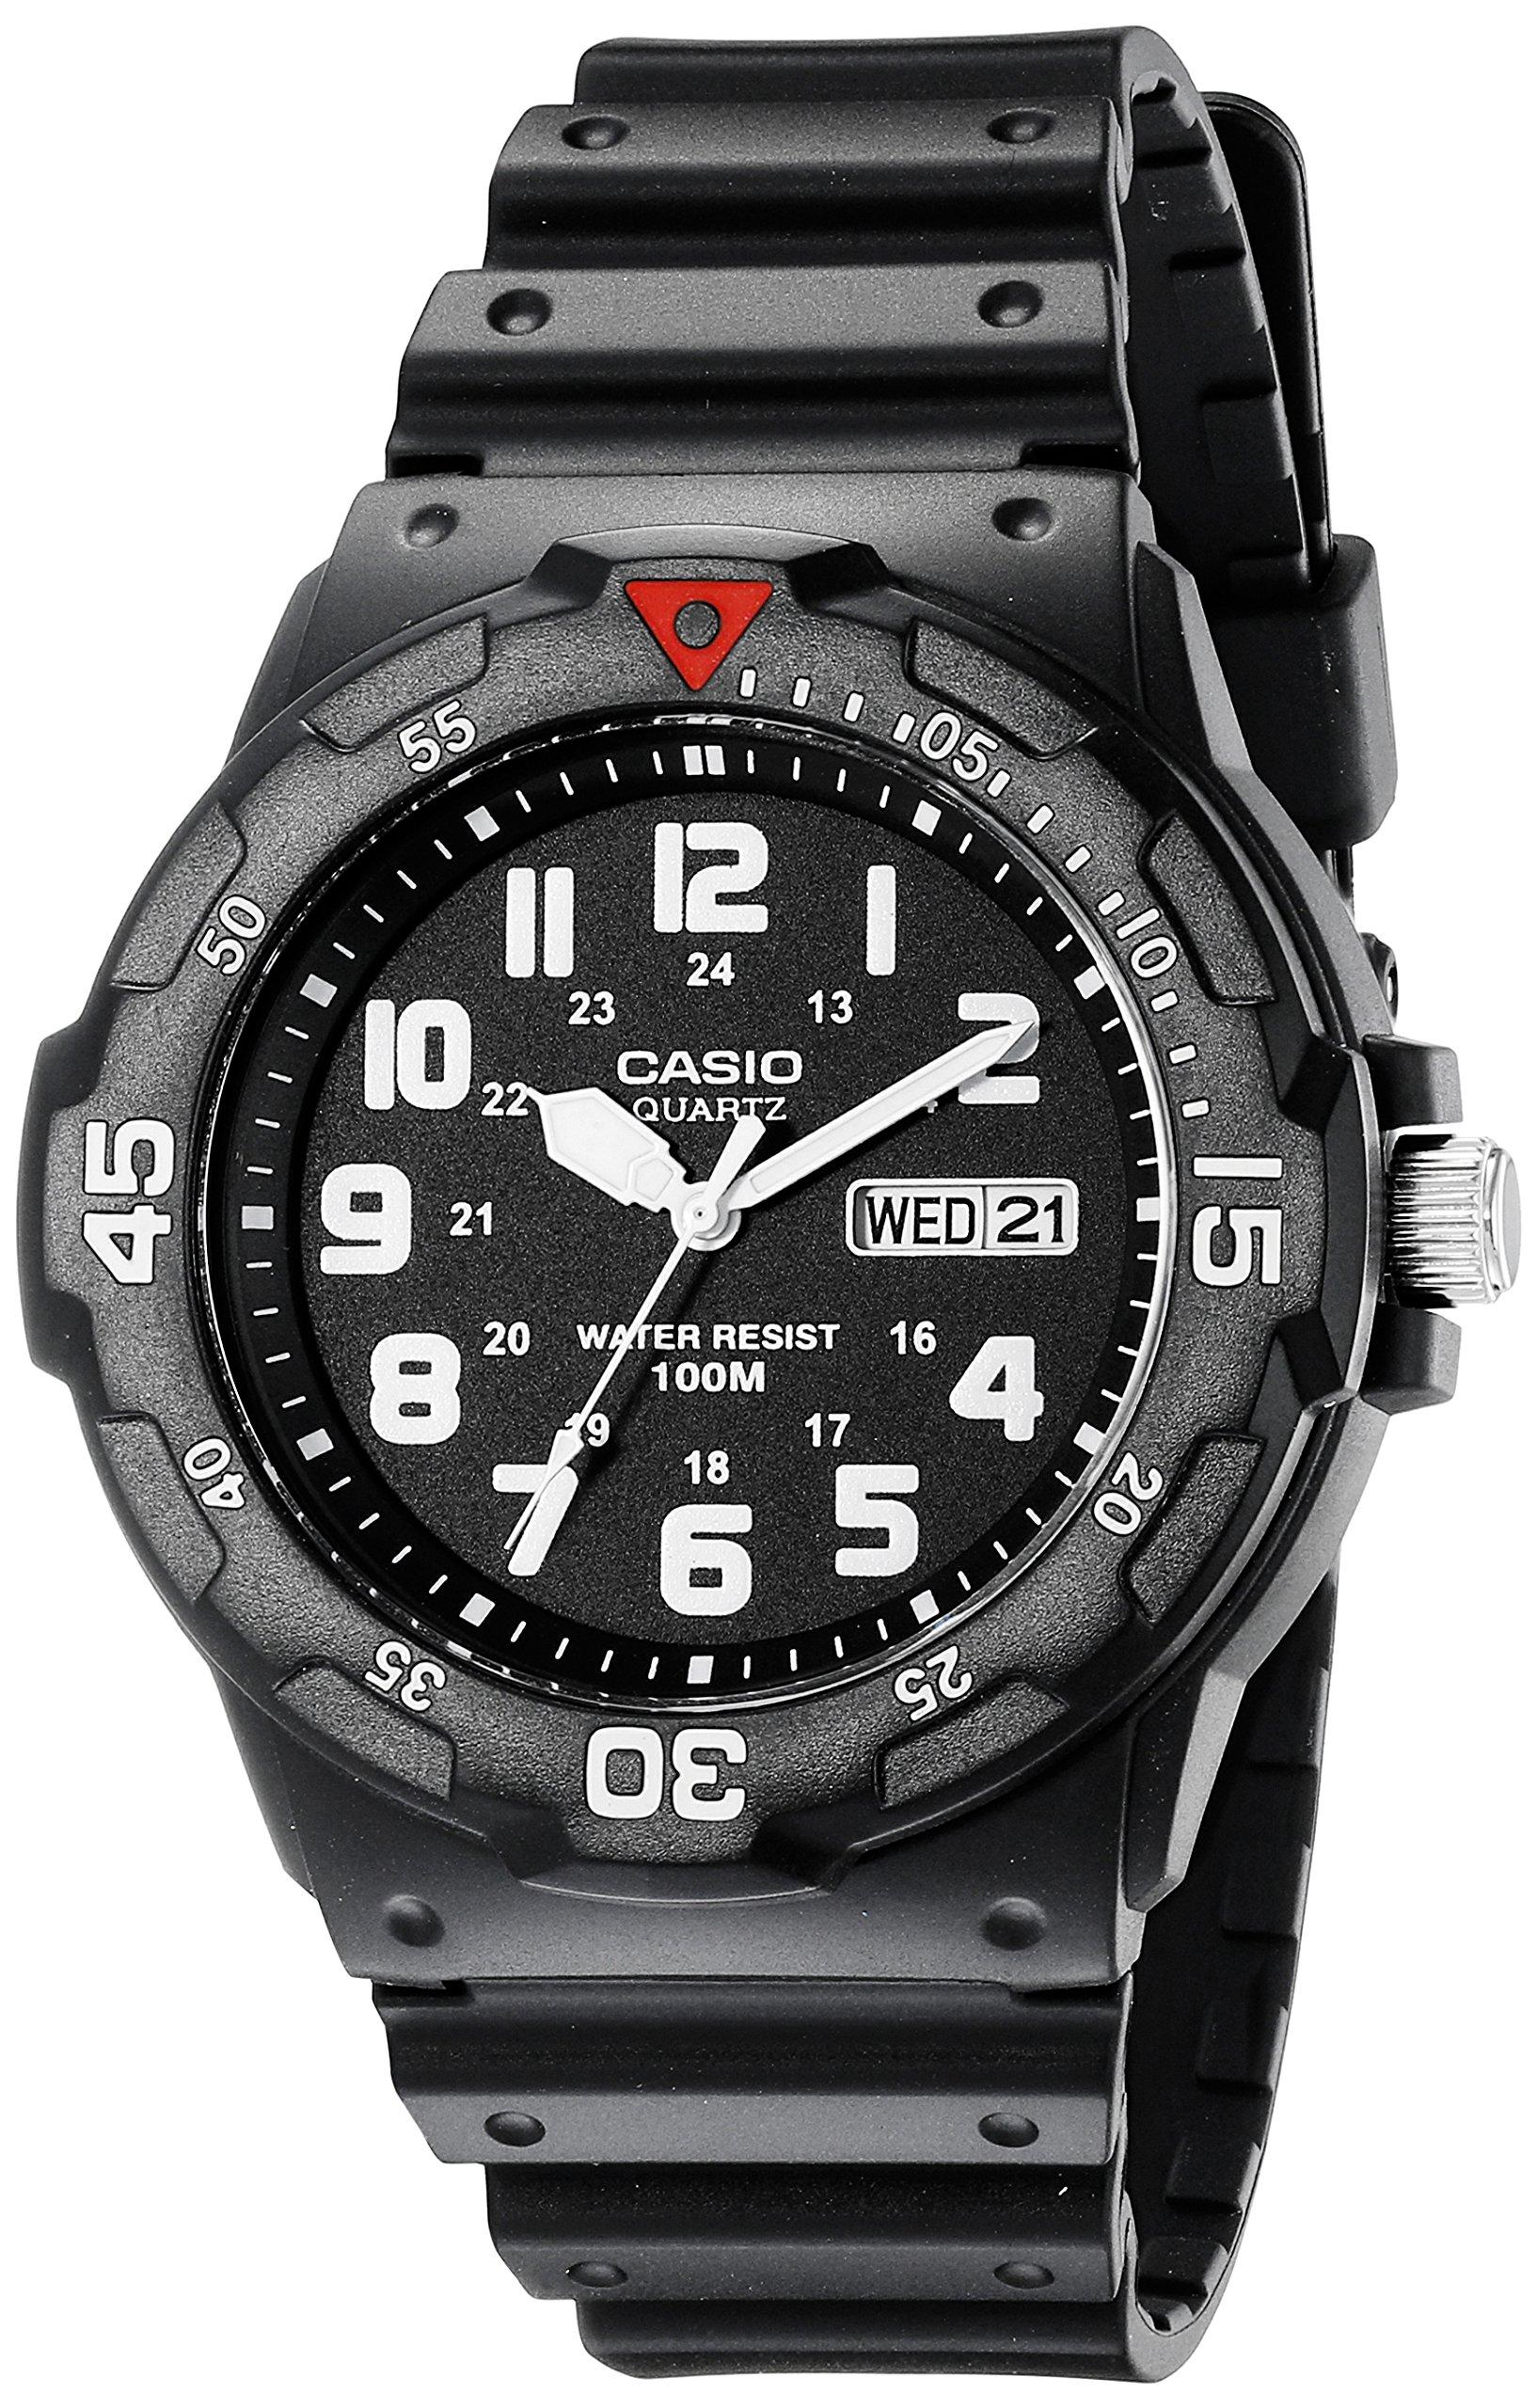 Casio EAW-MRW-200H-1BV  Men's MRW200H-1BV Black Resin Dive Watch by Casio